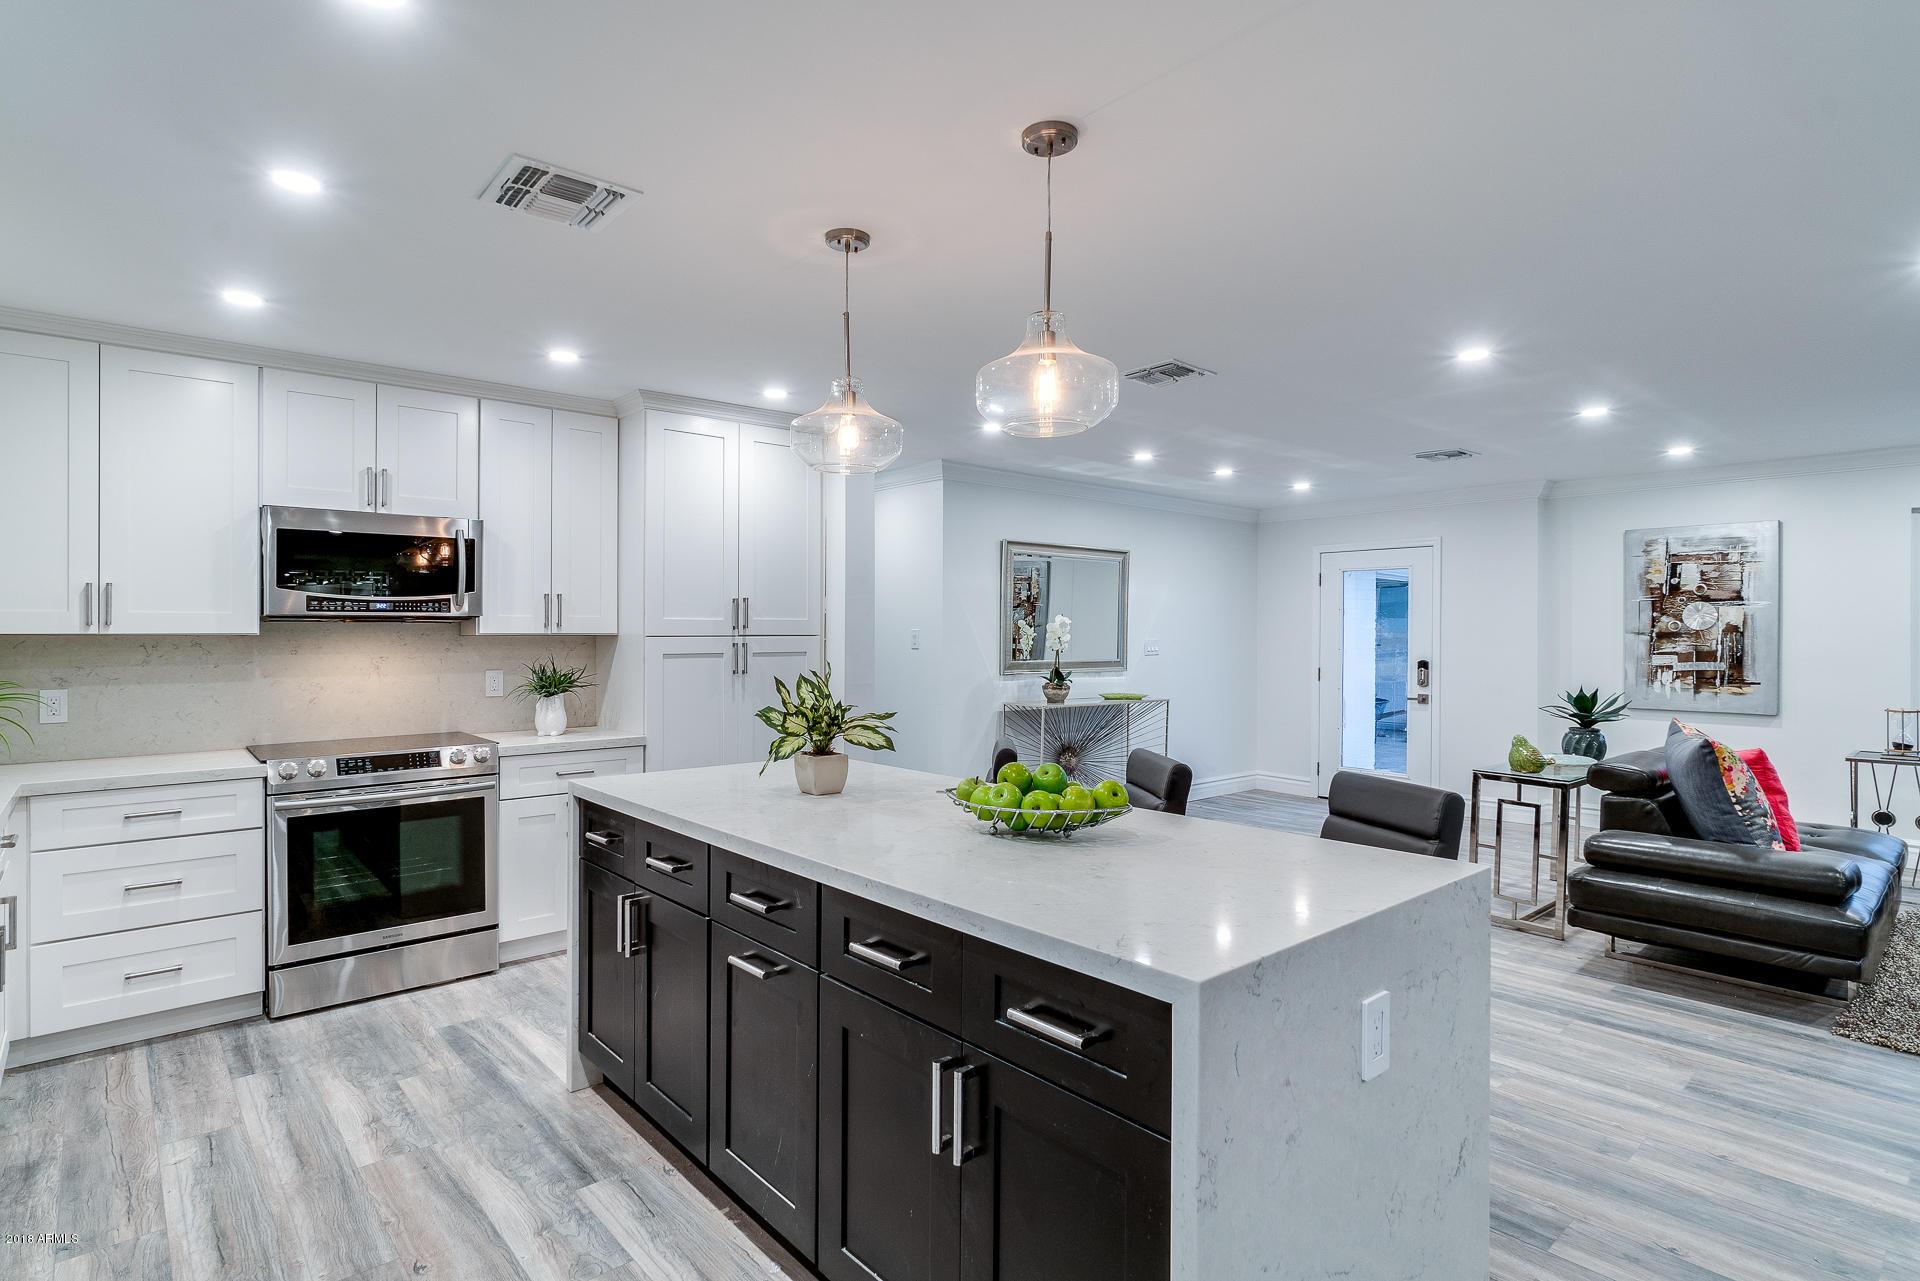 Find a home in Scottsdale or Phoenix Arizona